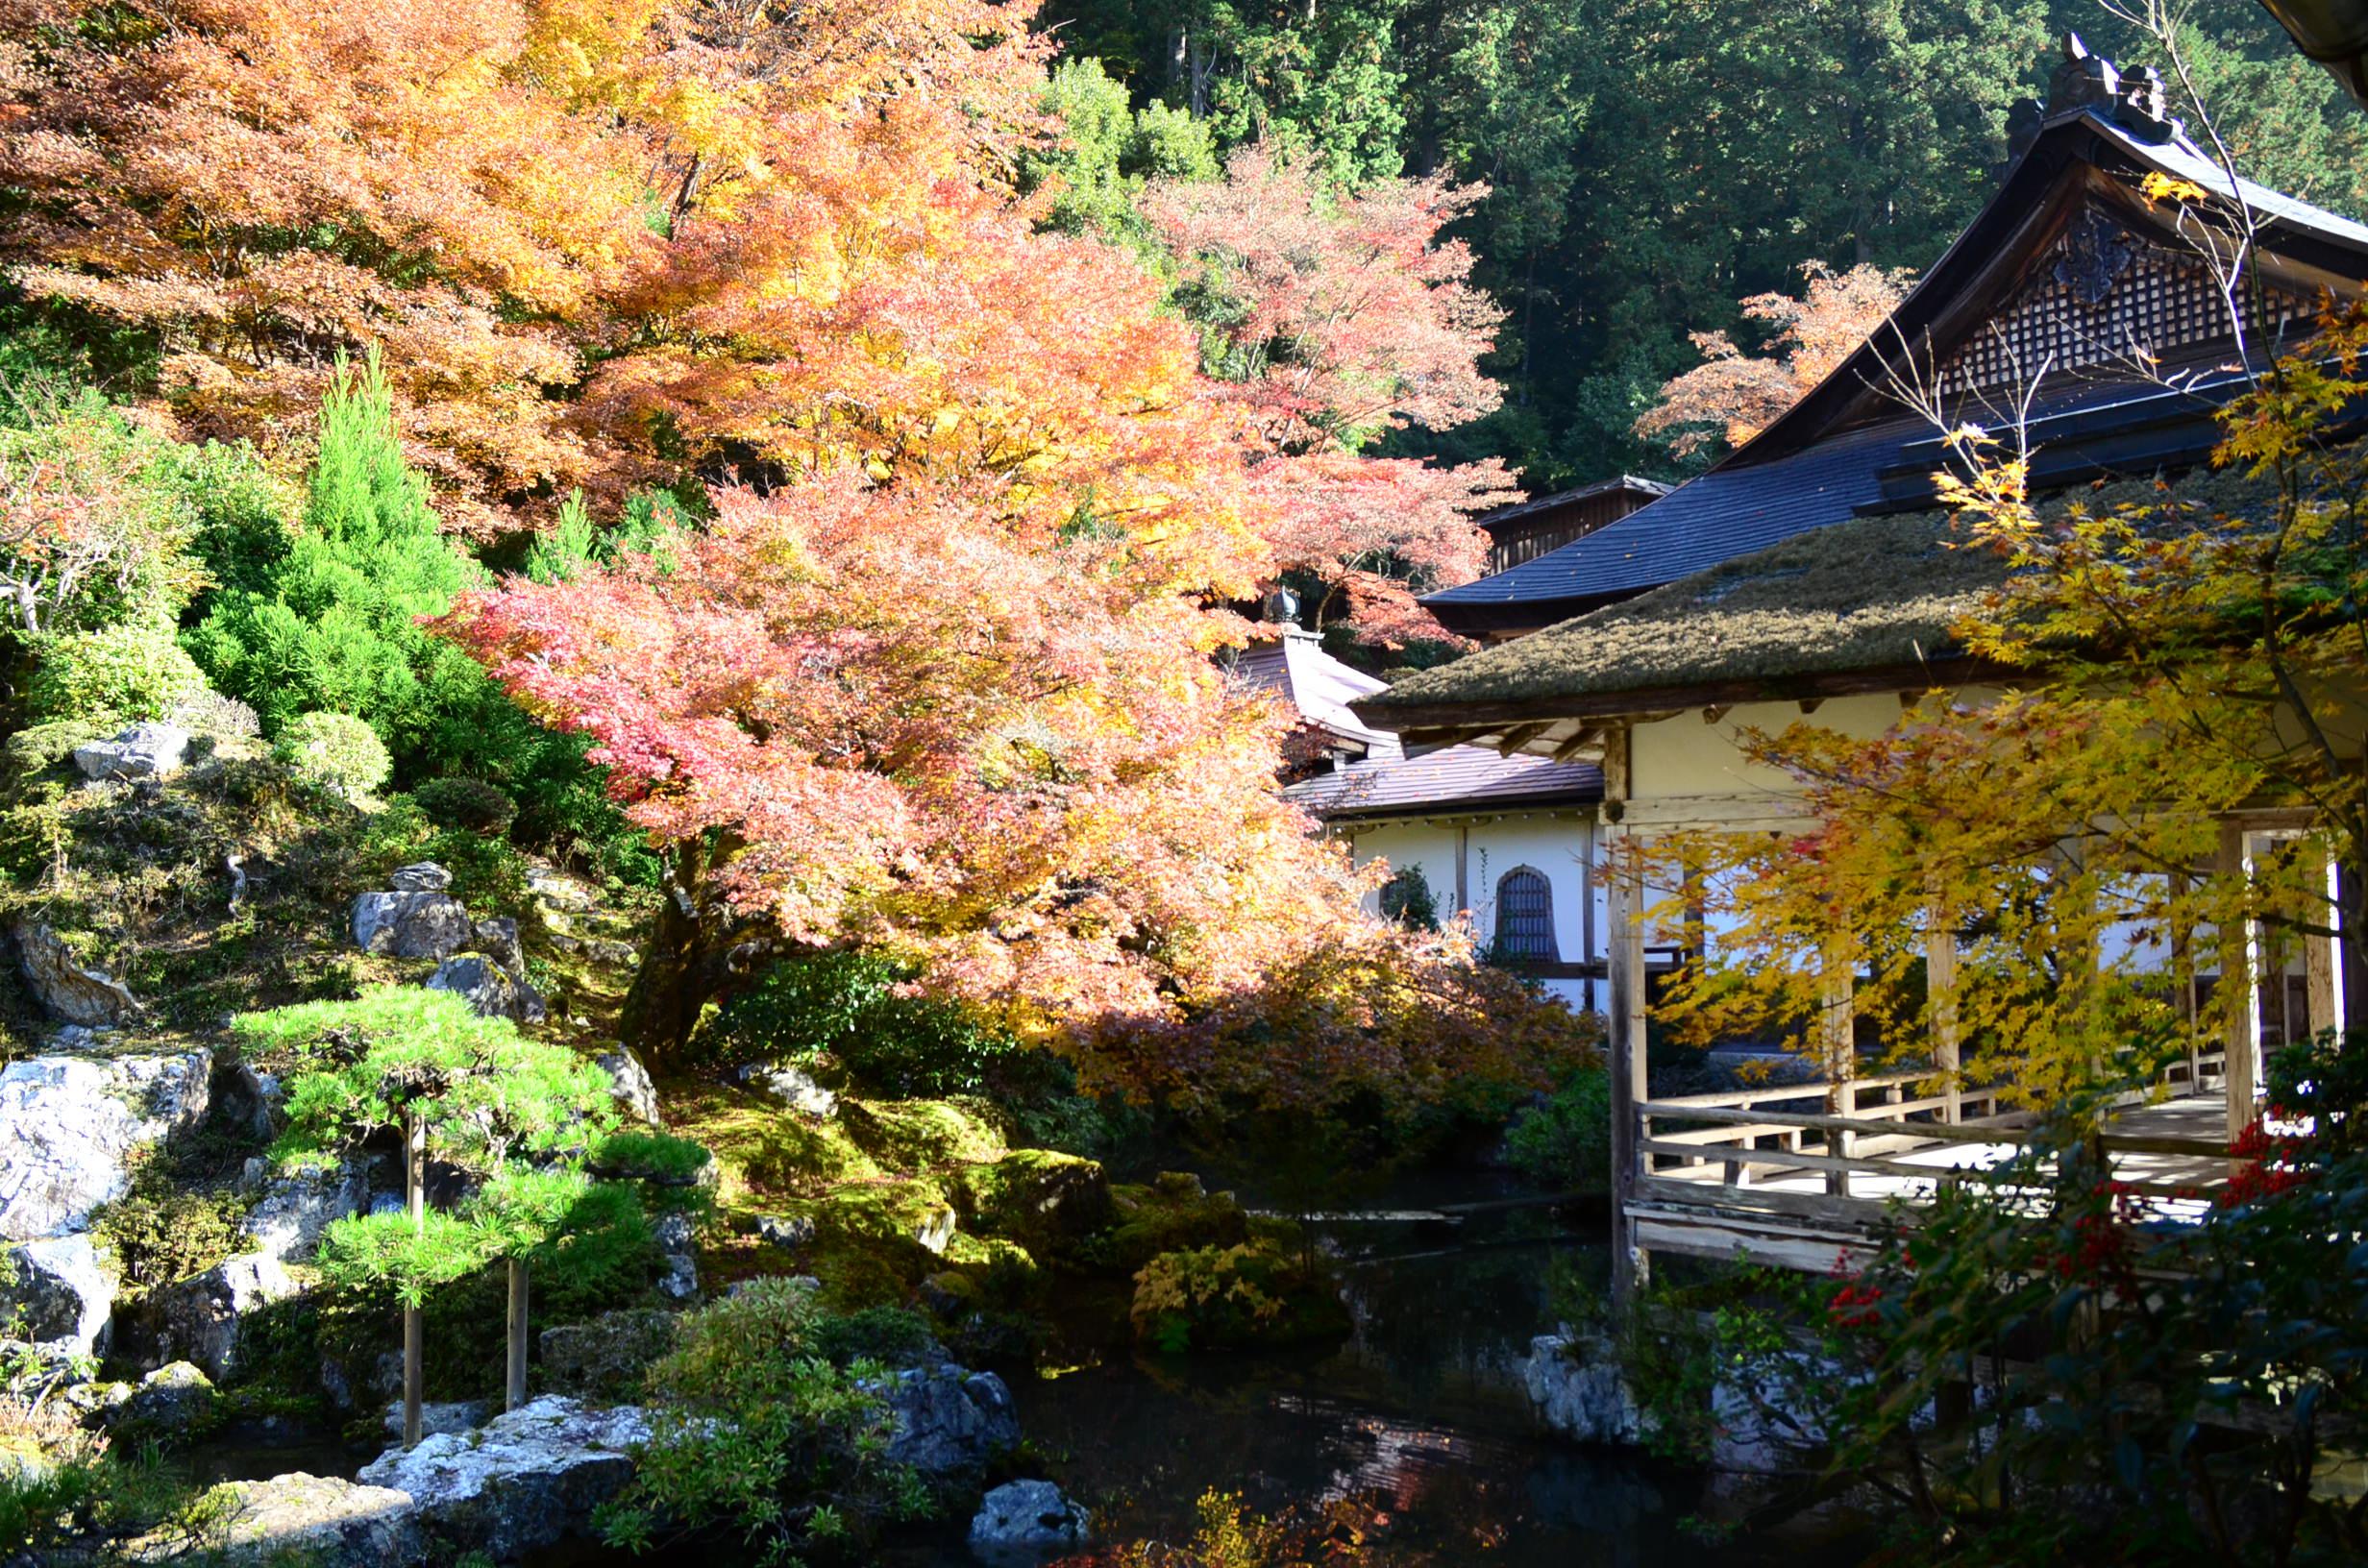 Peaceful Zen temple